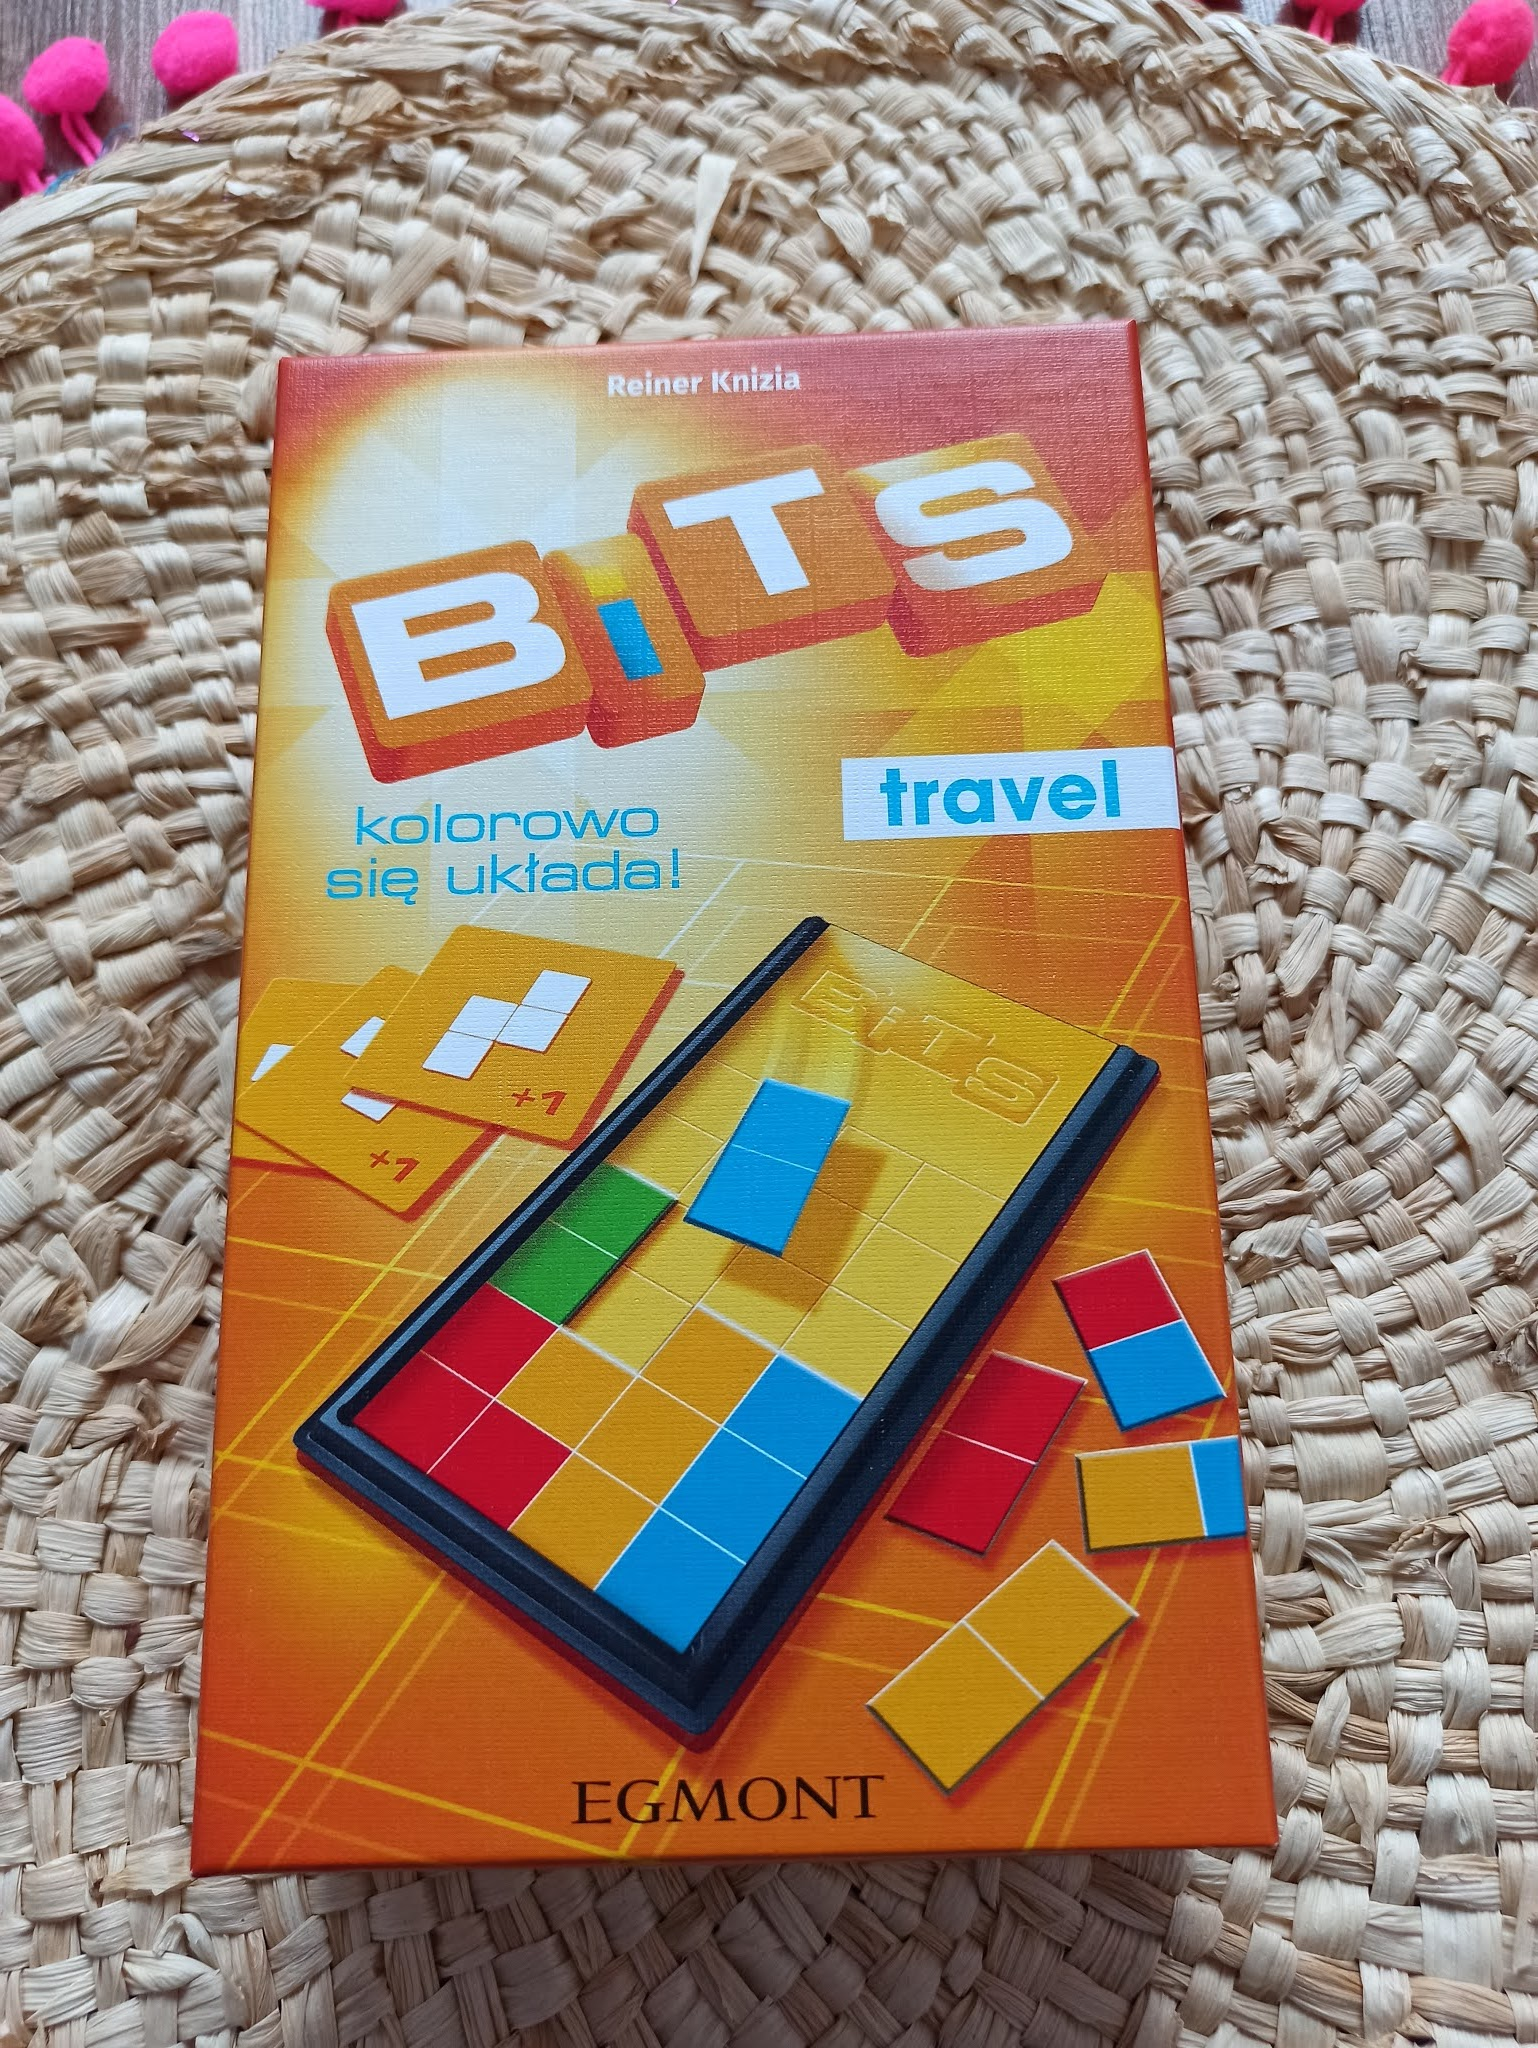 Bits travel - Egmont - recenzja